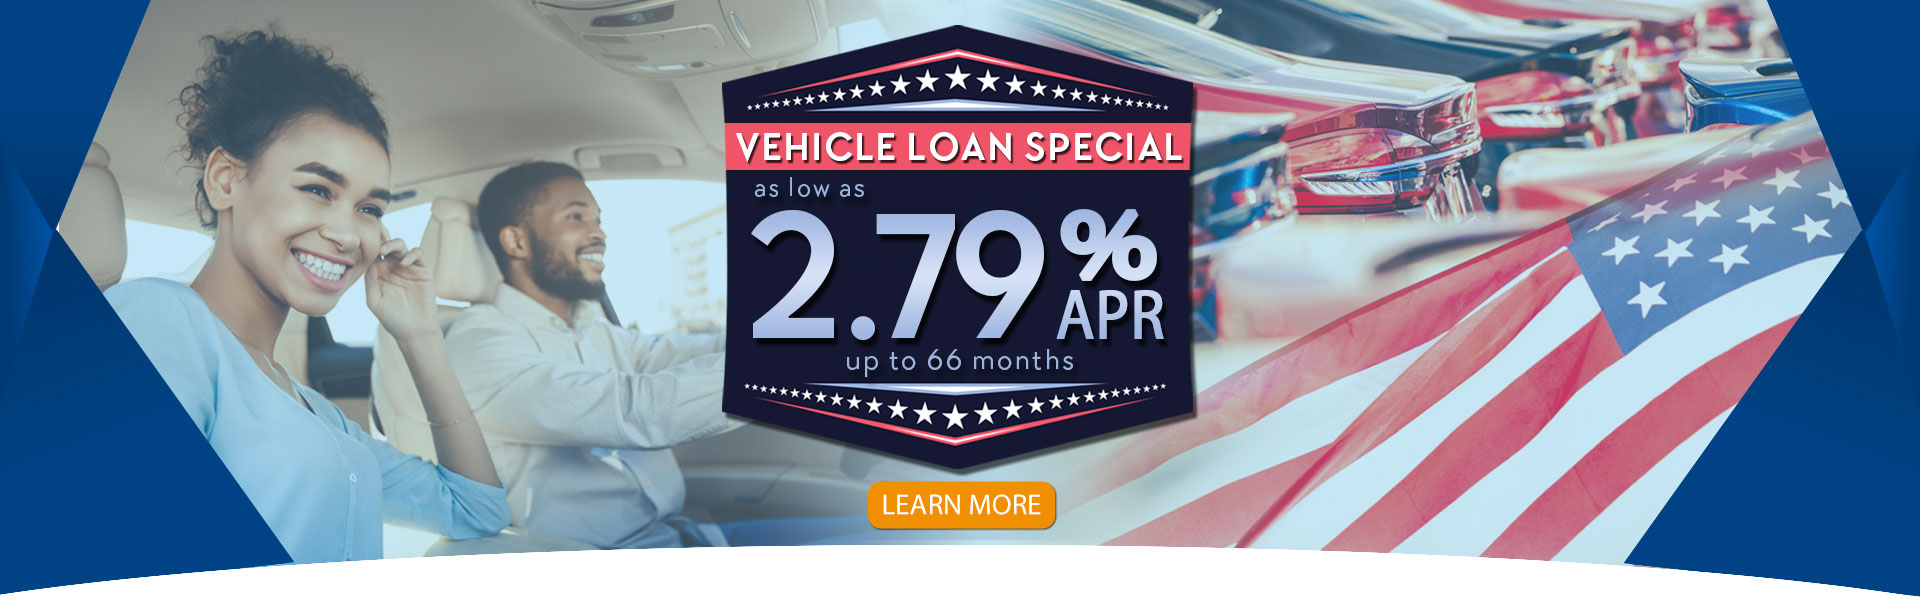 2.79% APR Auto Loan Special